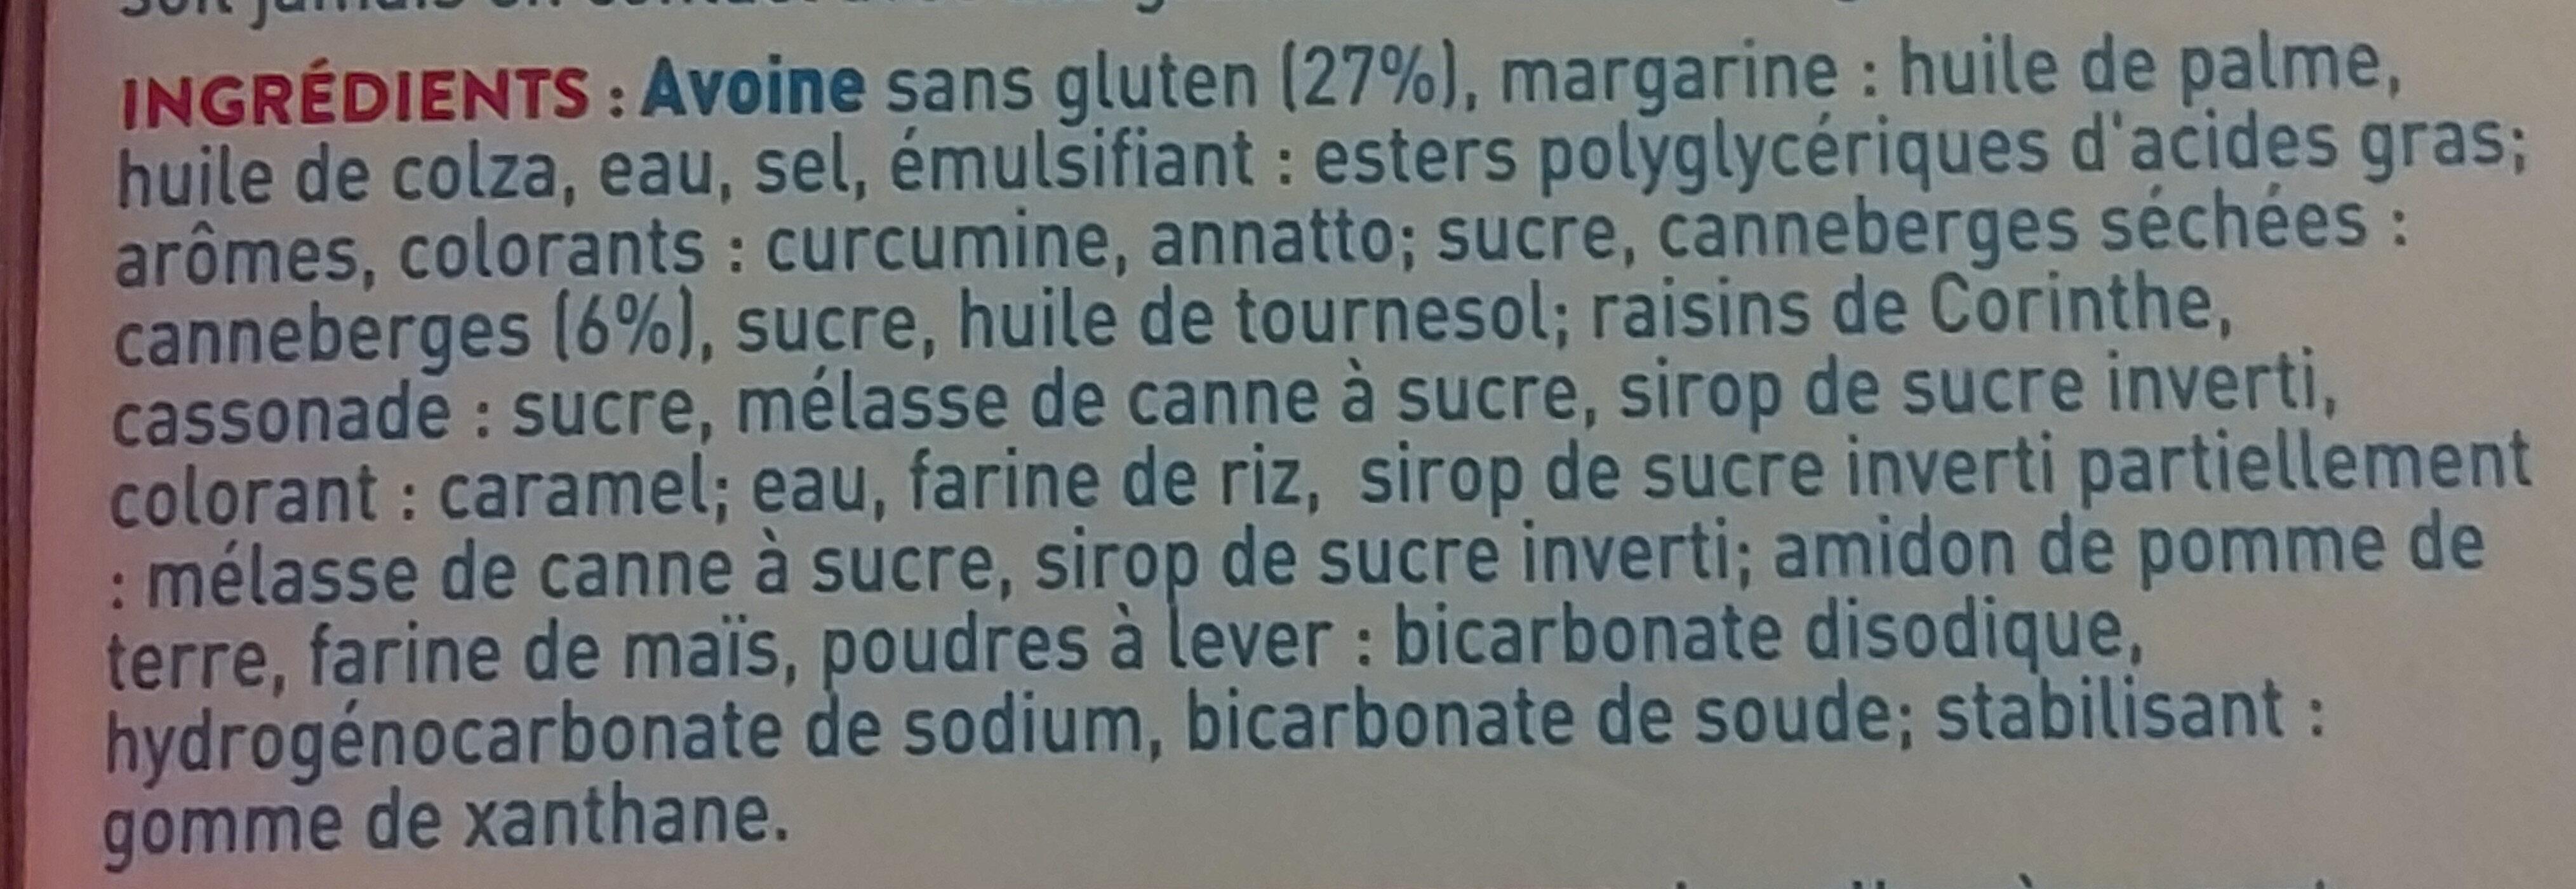 Biscuits p'tit dej fruits rouges - Ingredients